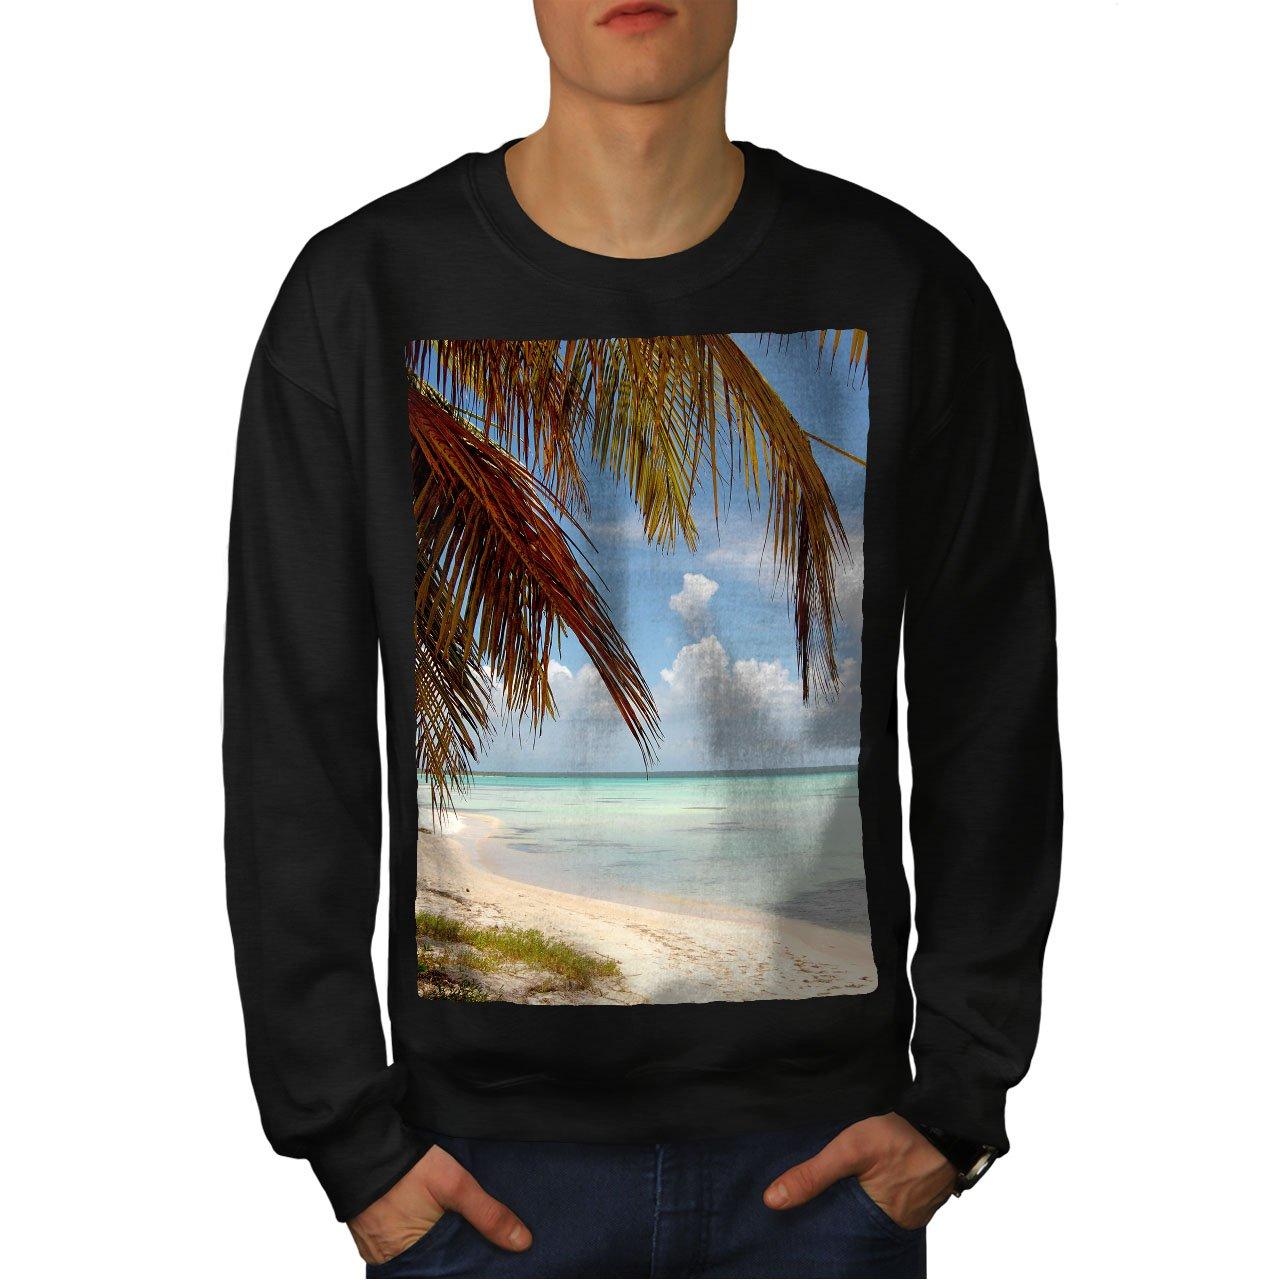 wellcoda Sunny Sandy Beach Mens Sweatshirt Palm Trees Casual Jumper